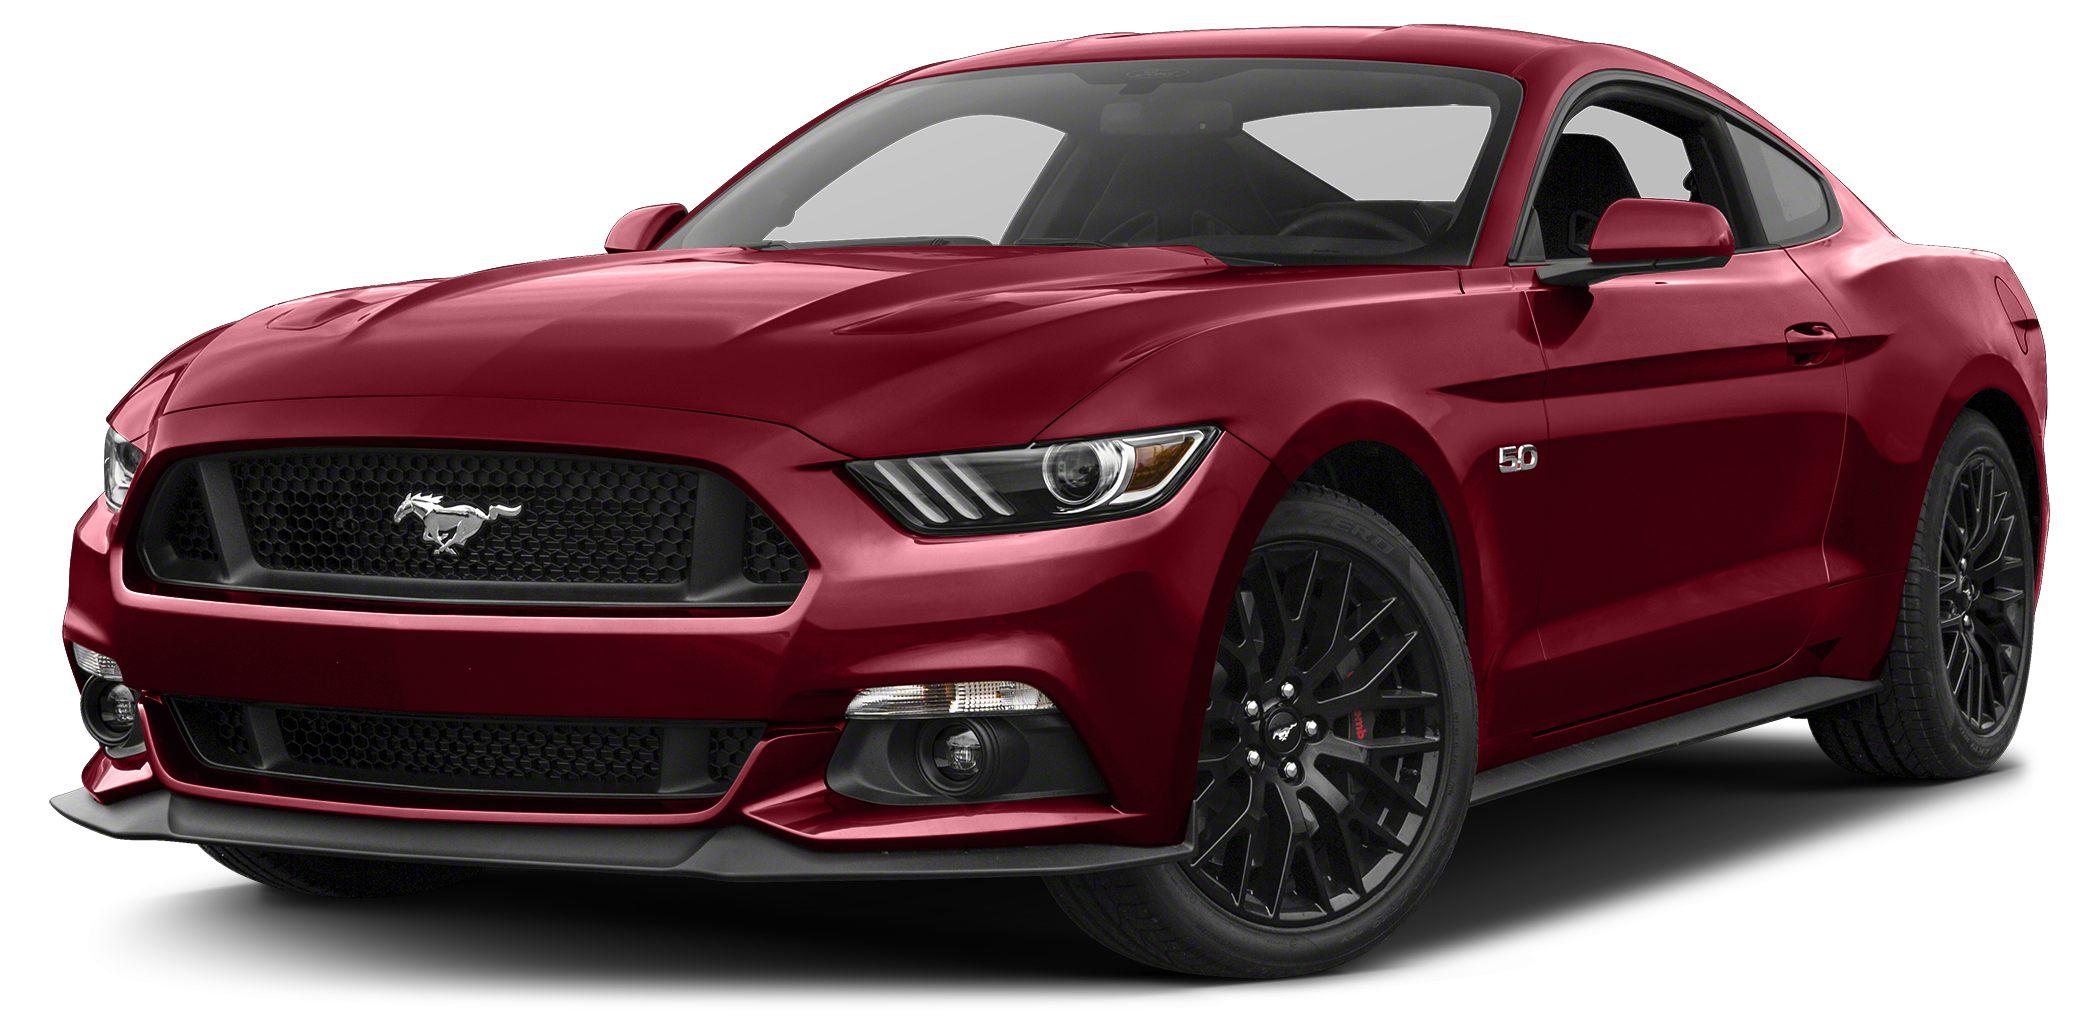 2015 Ford Mustang GT Premium Miles 6Color Black Stock F307120 VIN 1FA6P8CFXF5382706